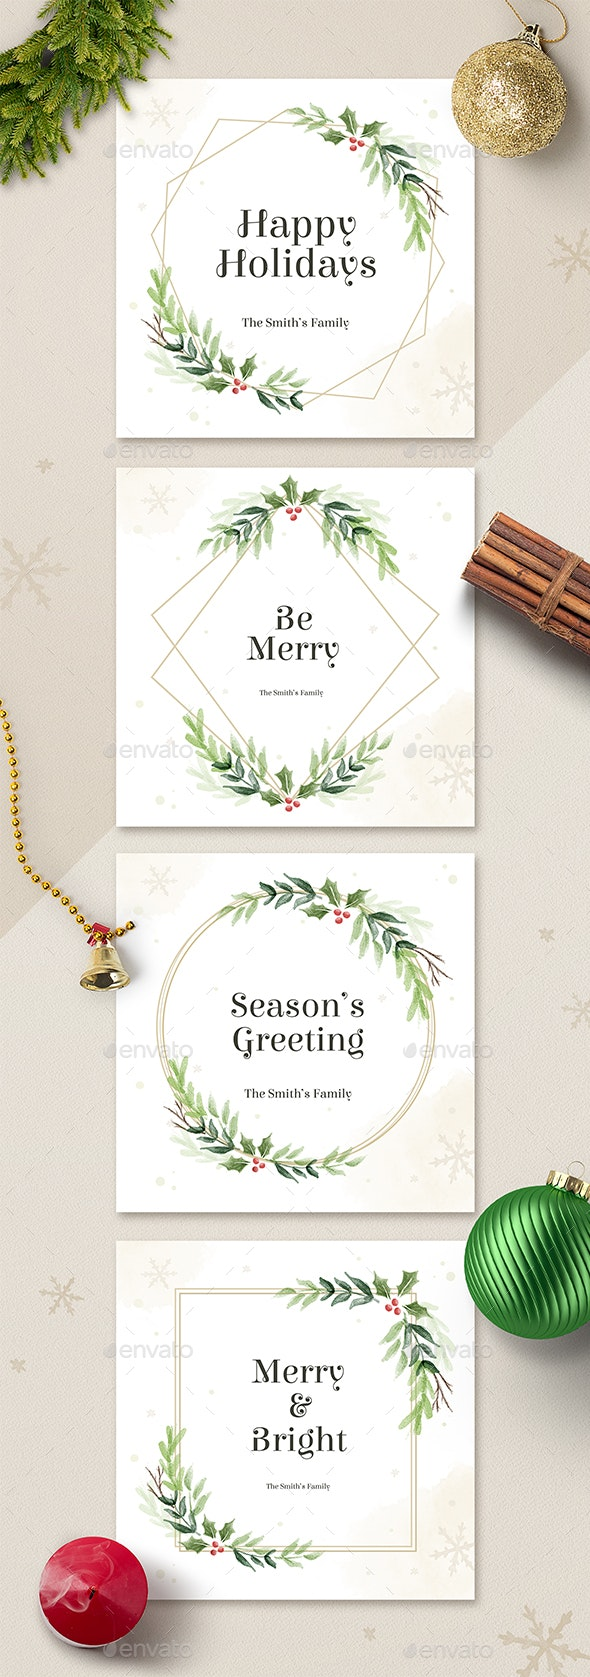 Holiday Cards Social Media Post - Social Media Web Elements